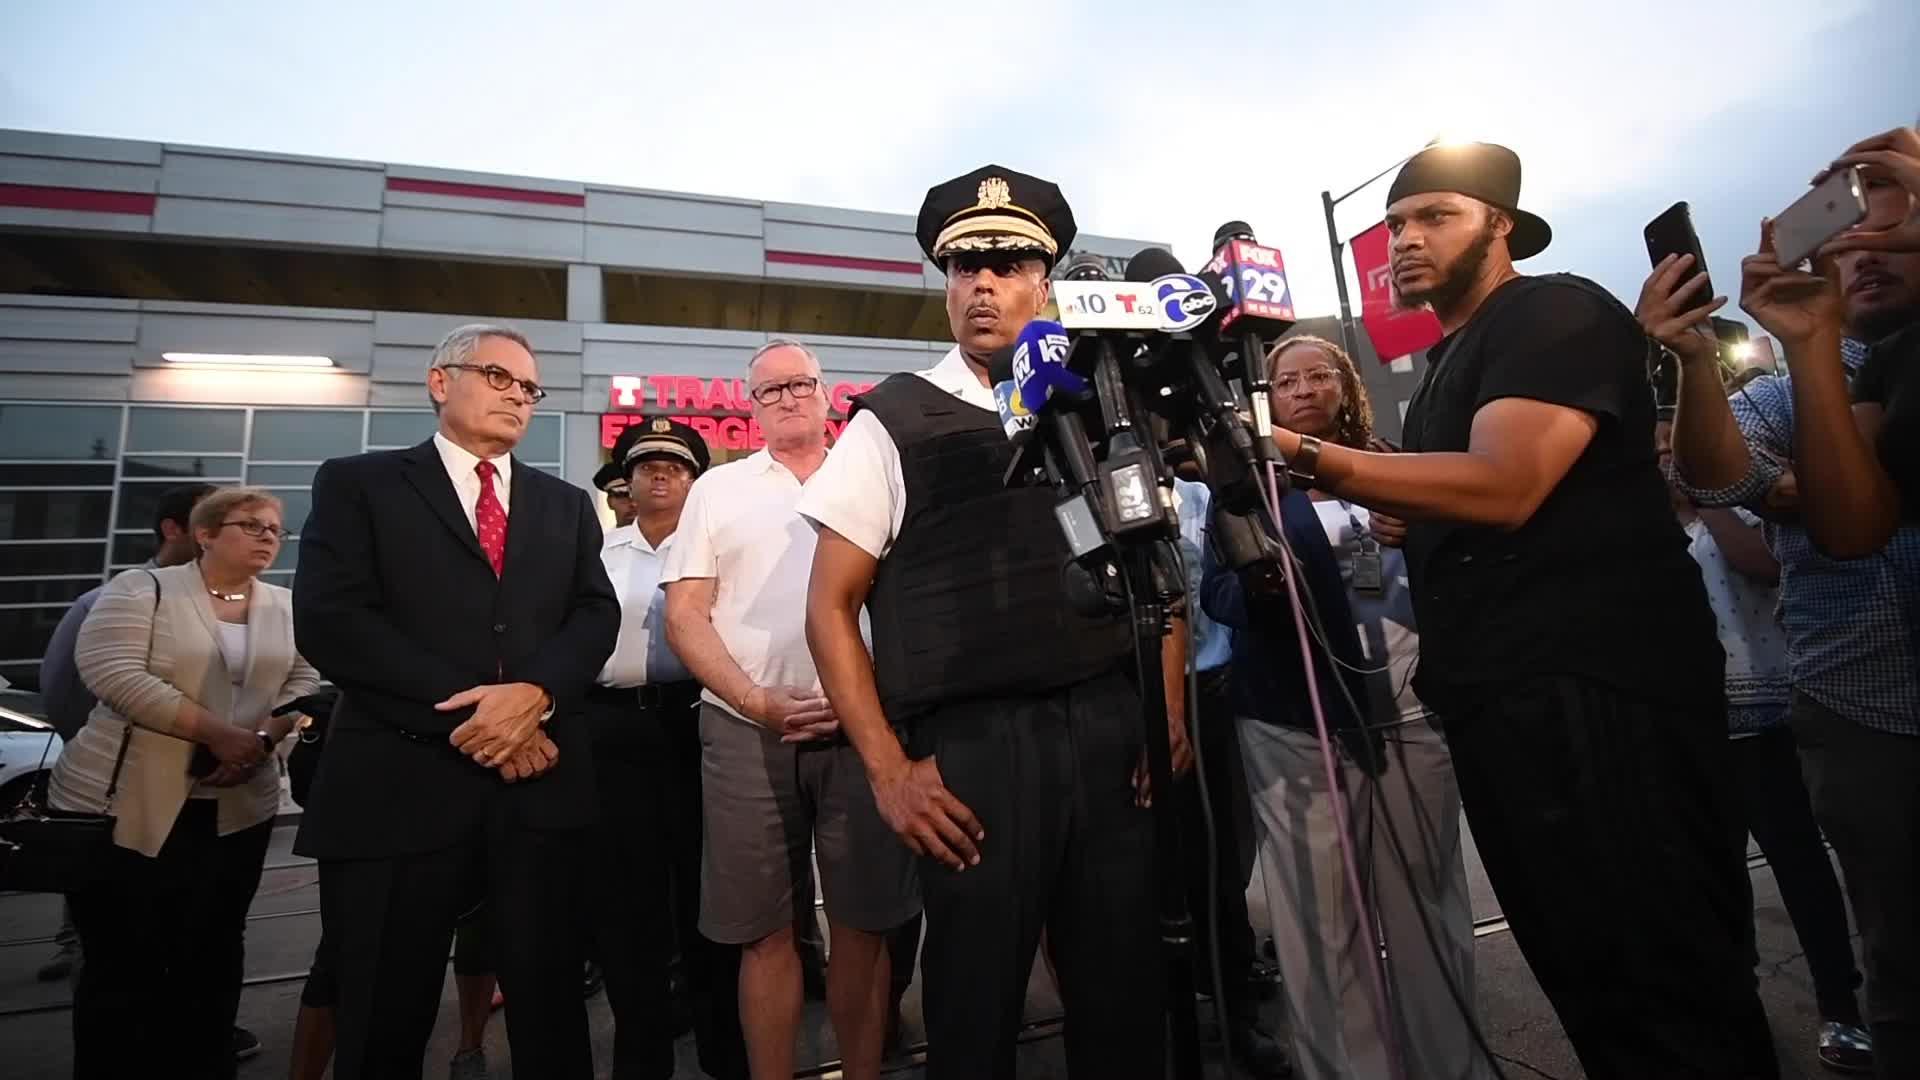 Philly police shooting recap: Gunman had AR-15 and handgun